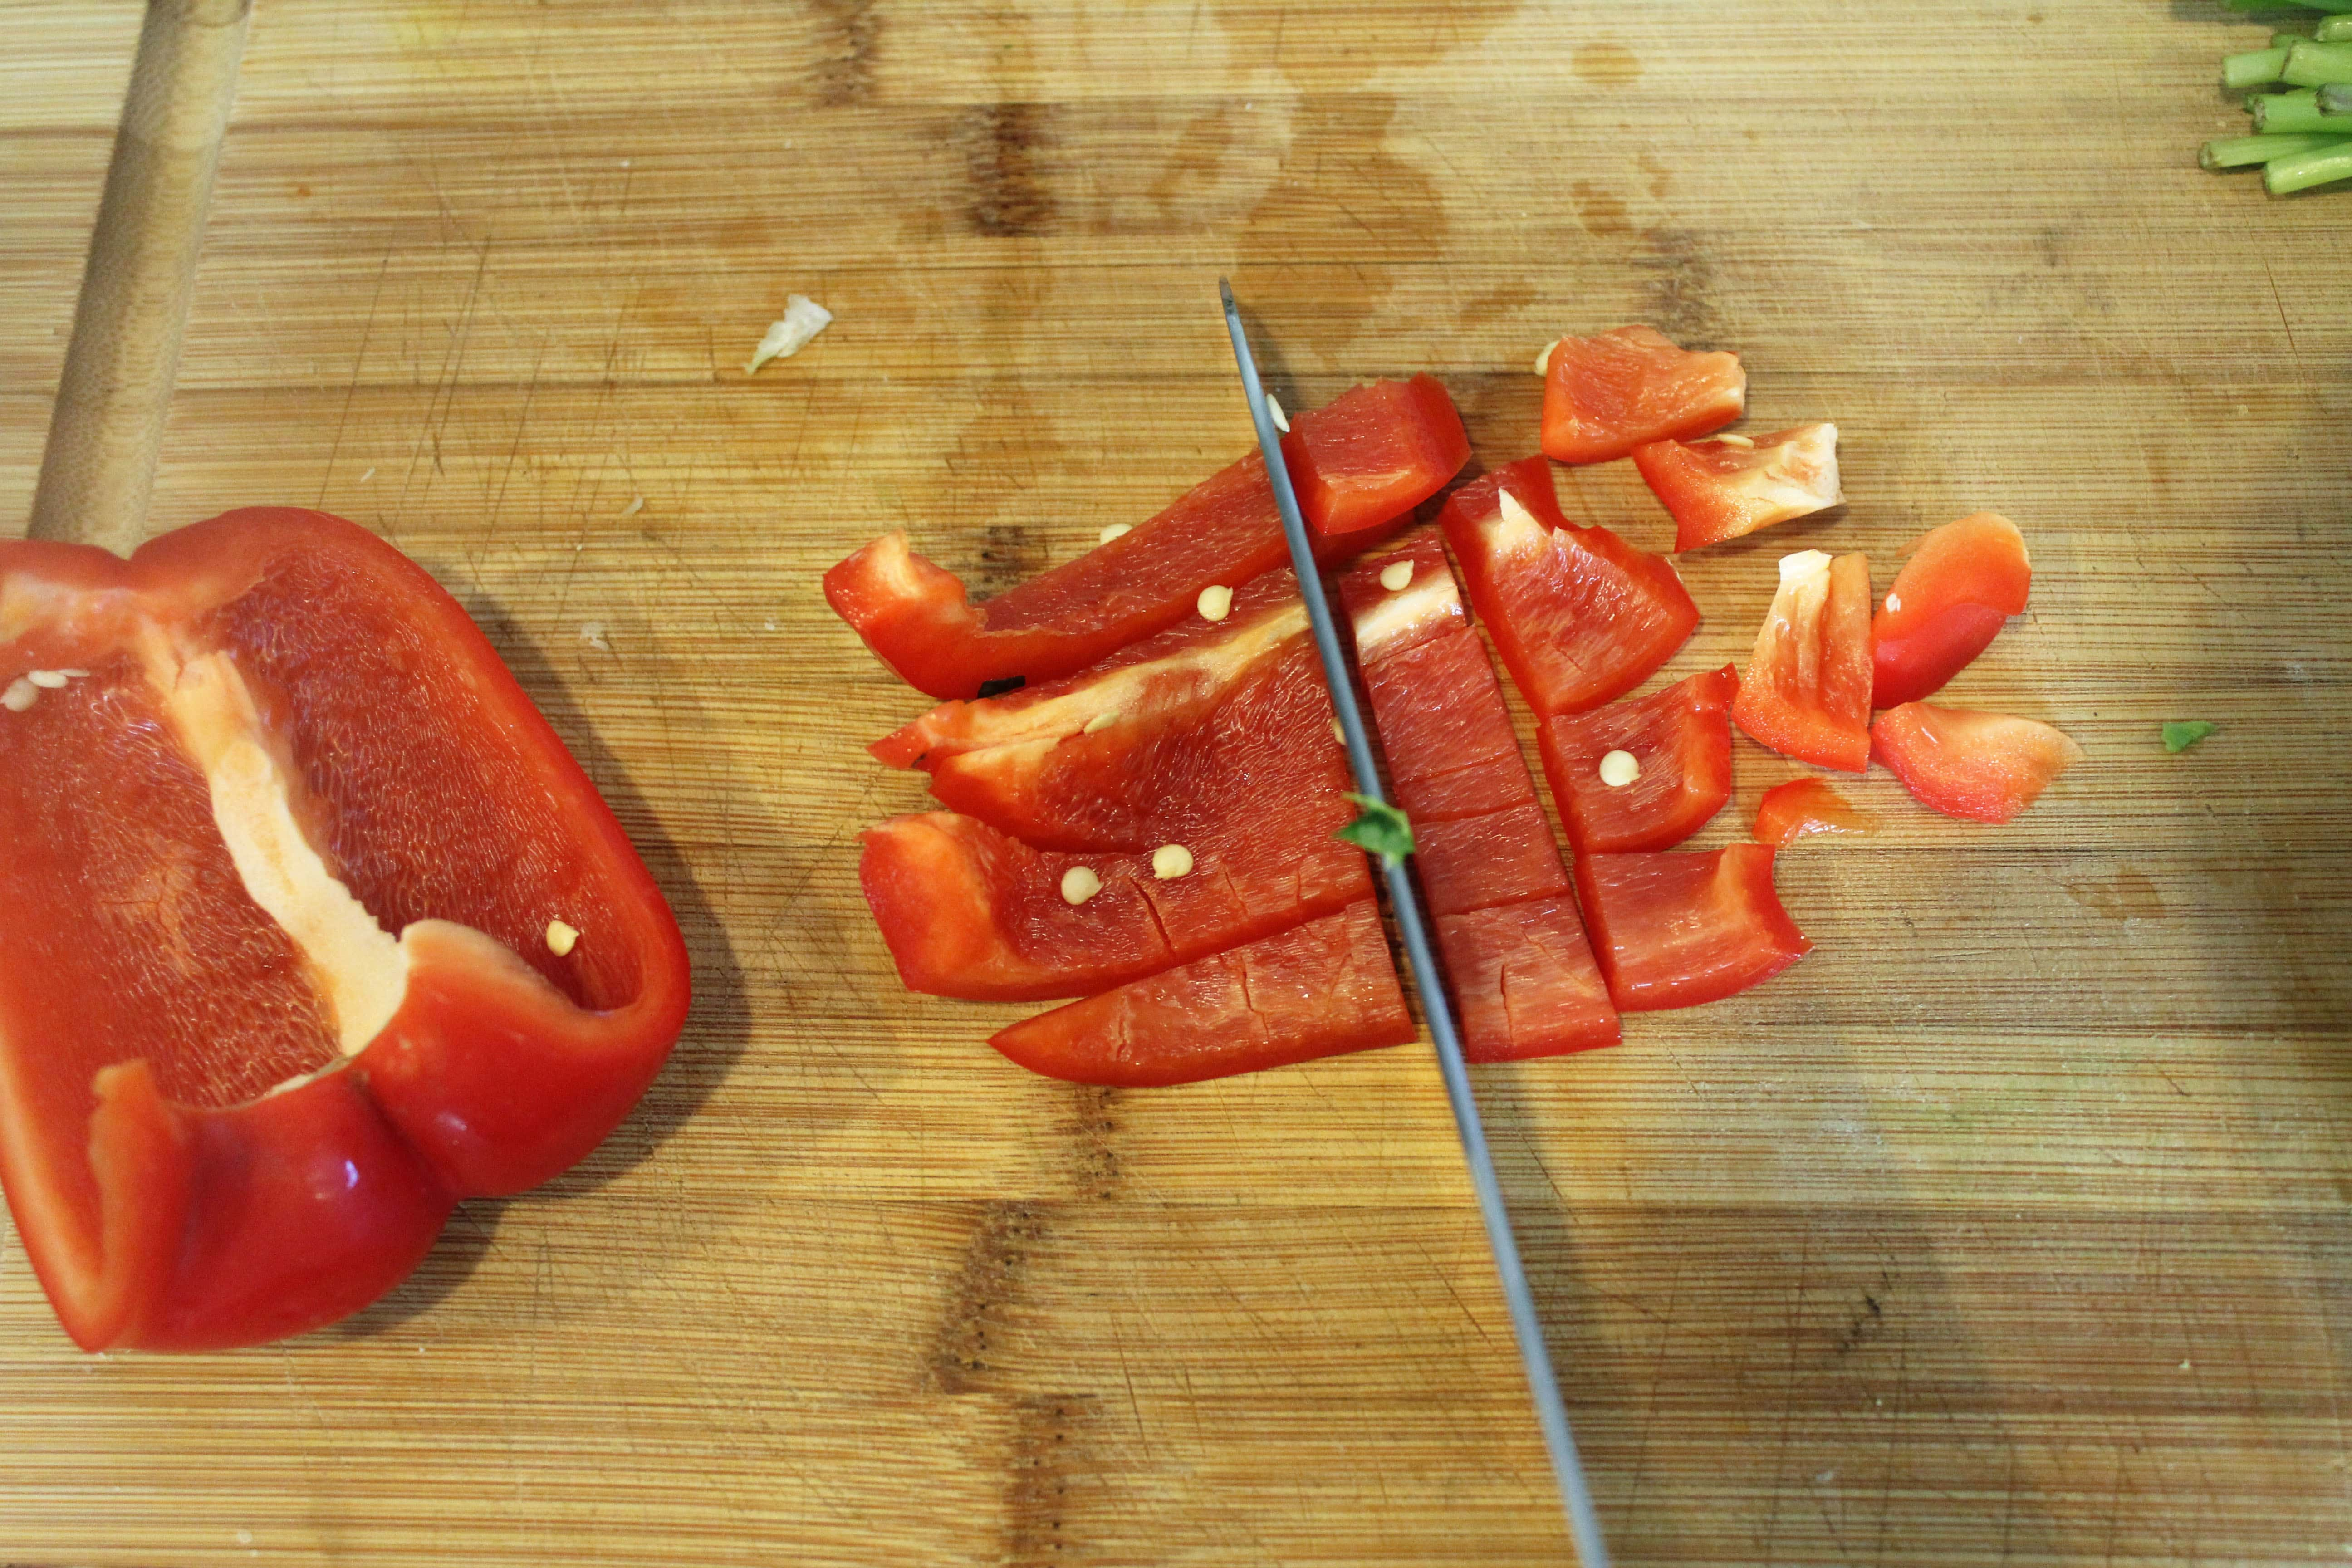 Chop sweet peppers